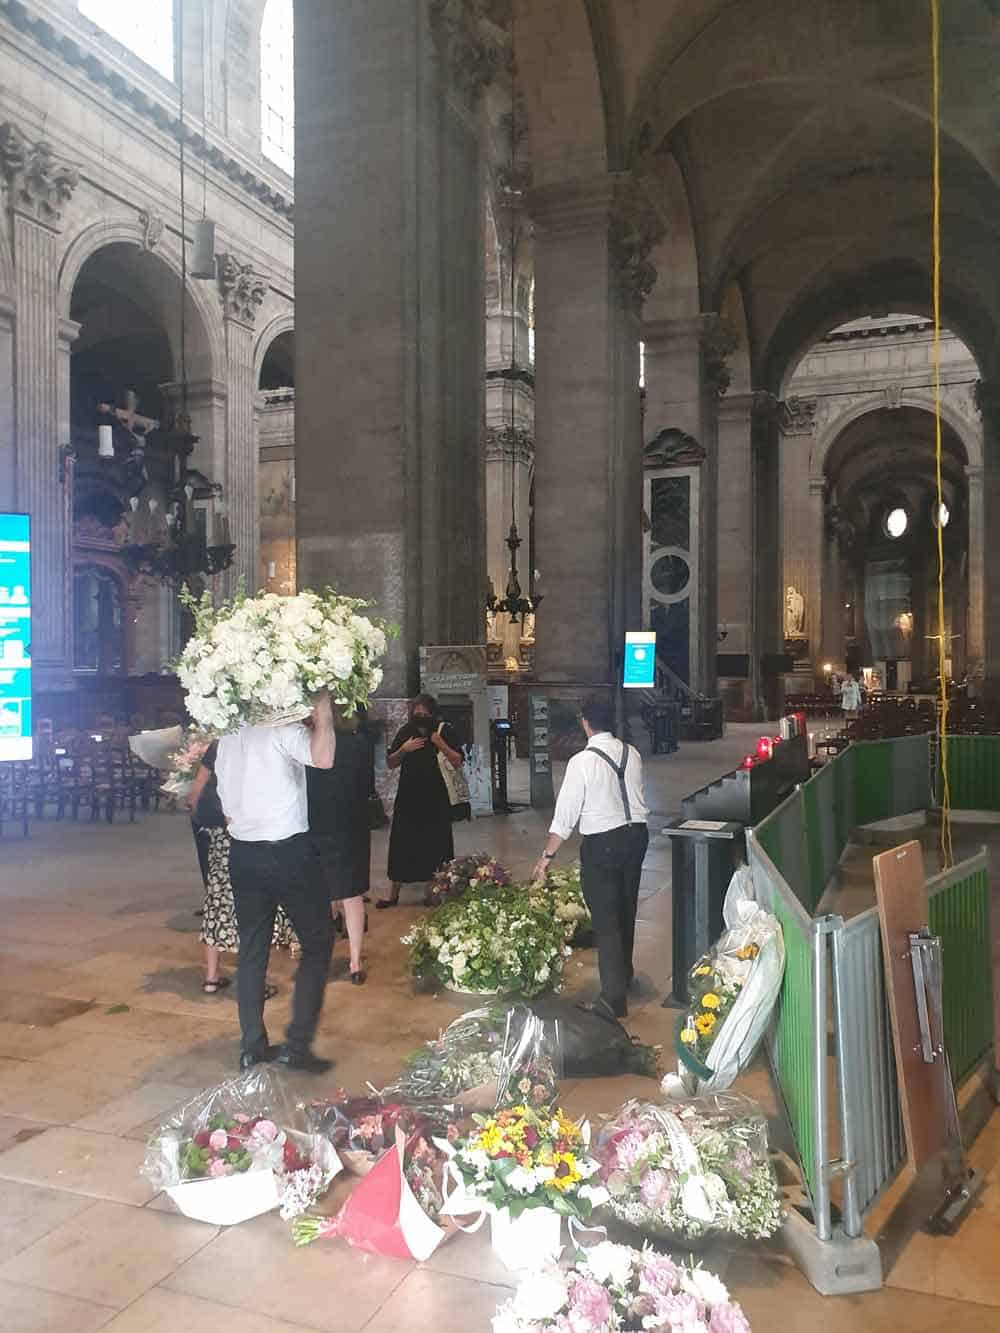 PRVA NAKON LOKDAUNA: Posle svadbe u Crkvi Sen Sulpis